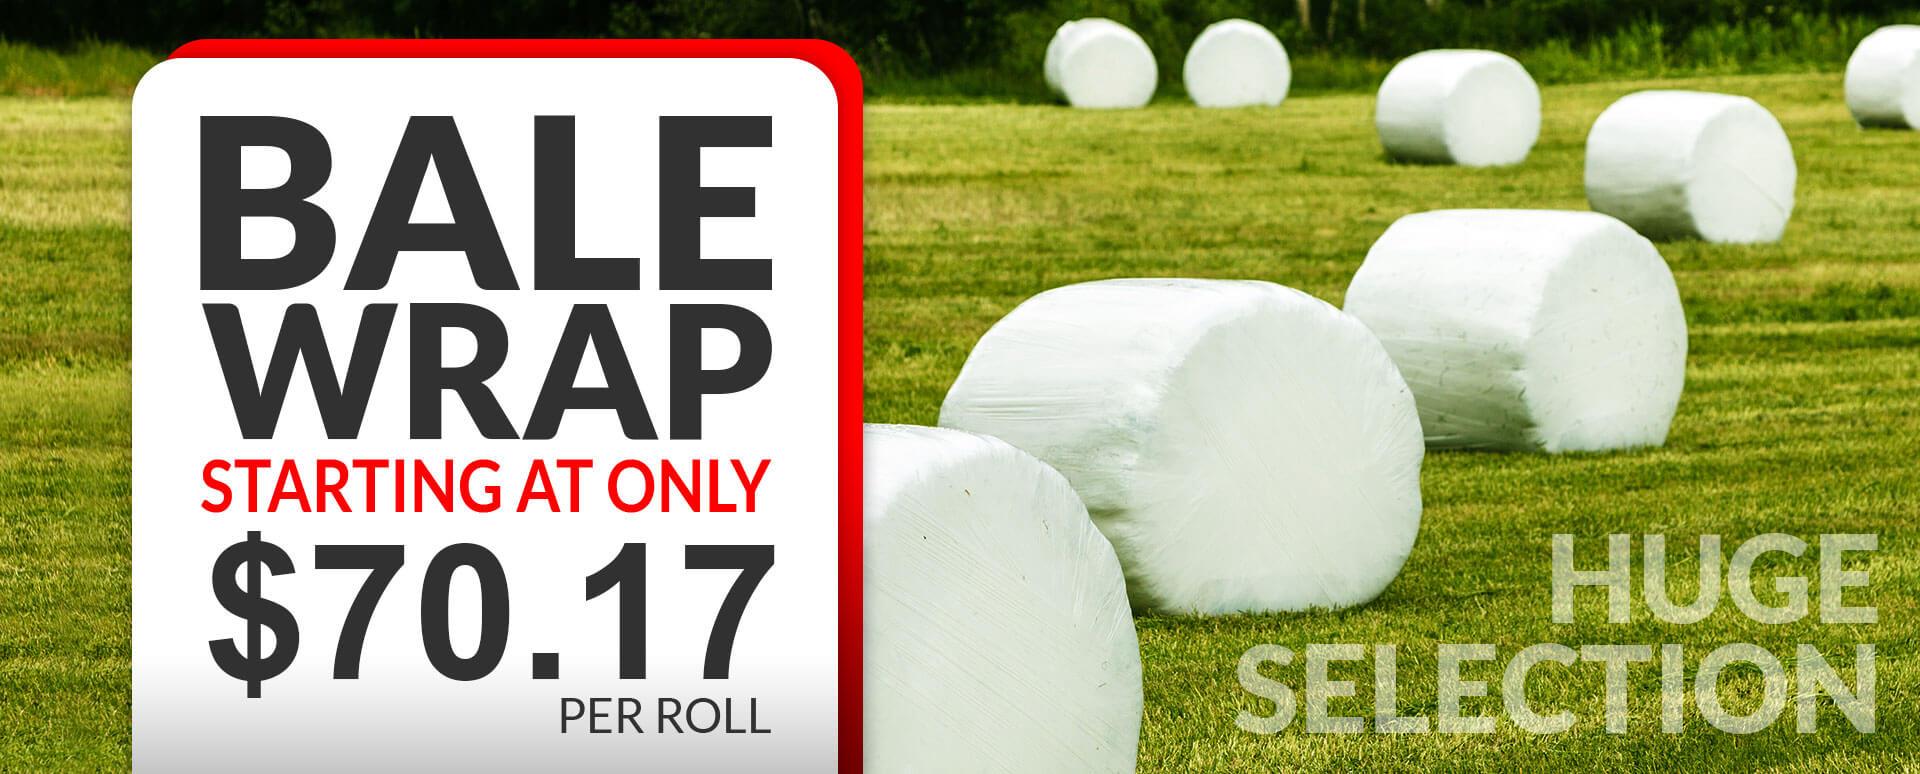 KSI Supply - Bale Wraps Huge Selection